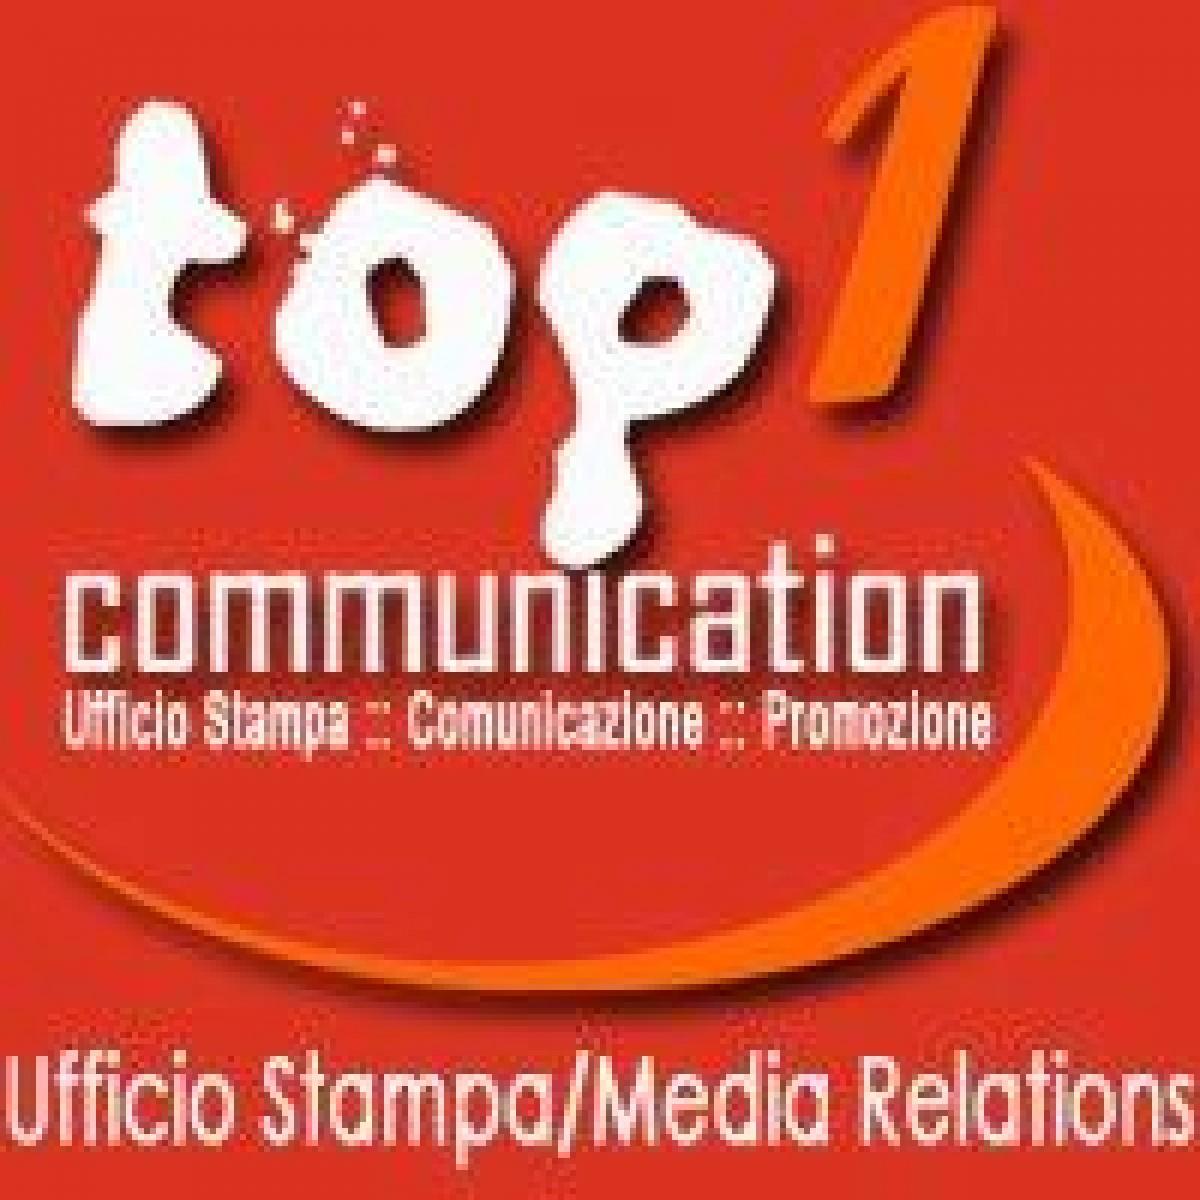 Top1 Communication